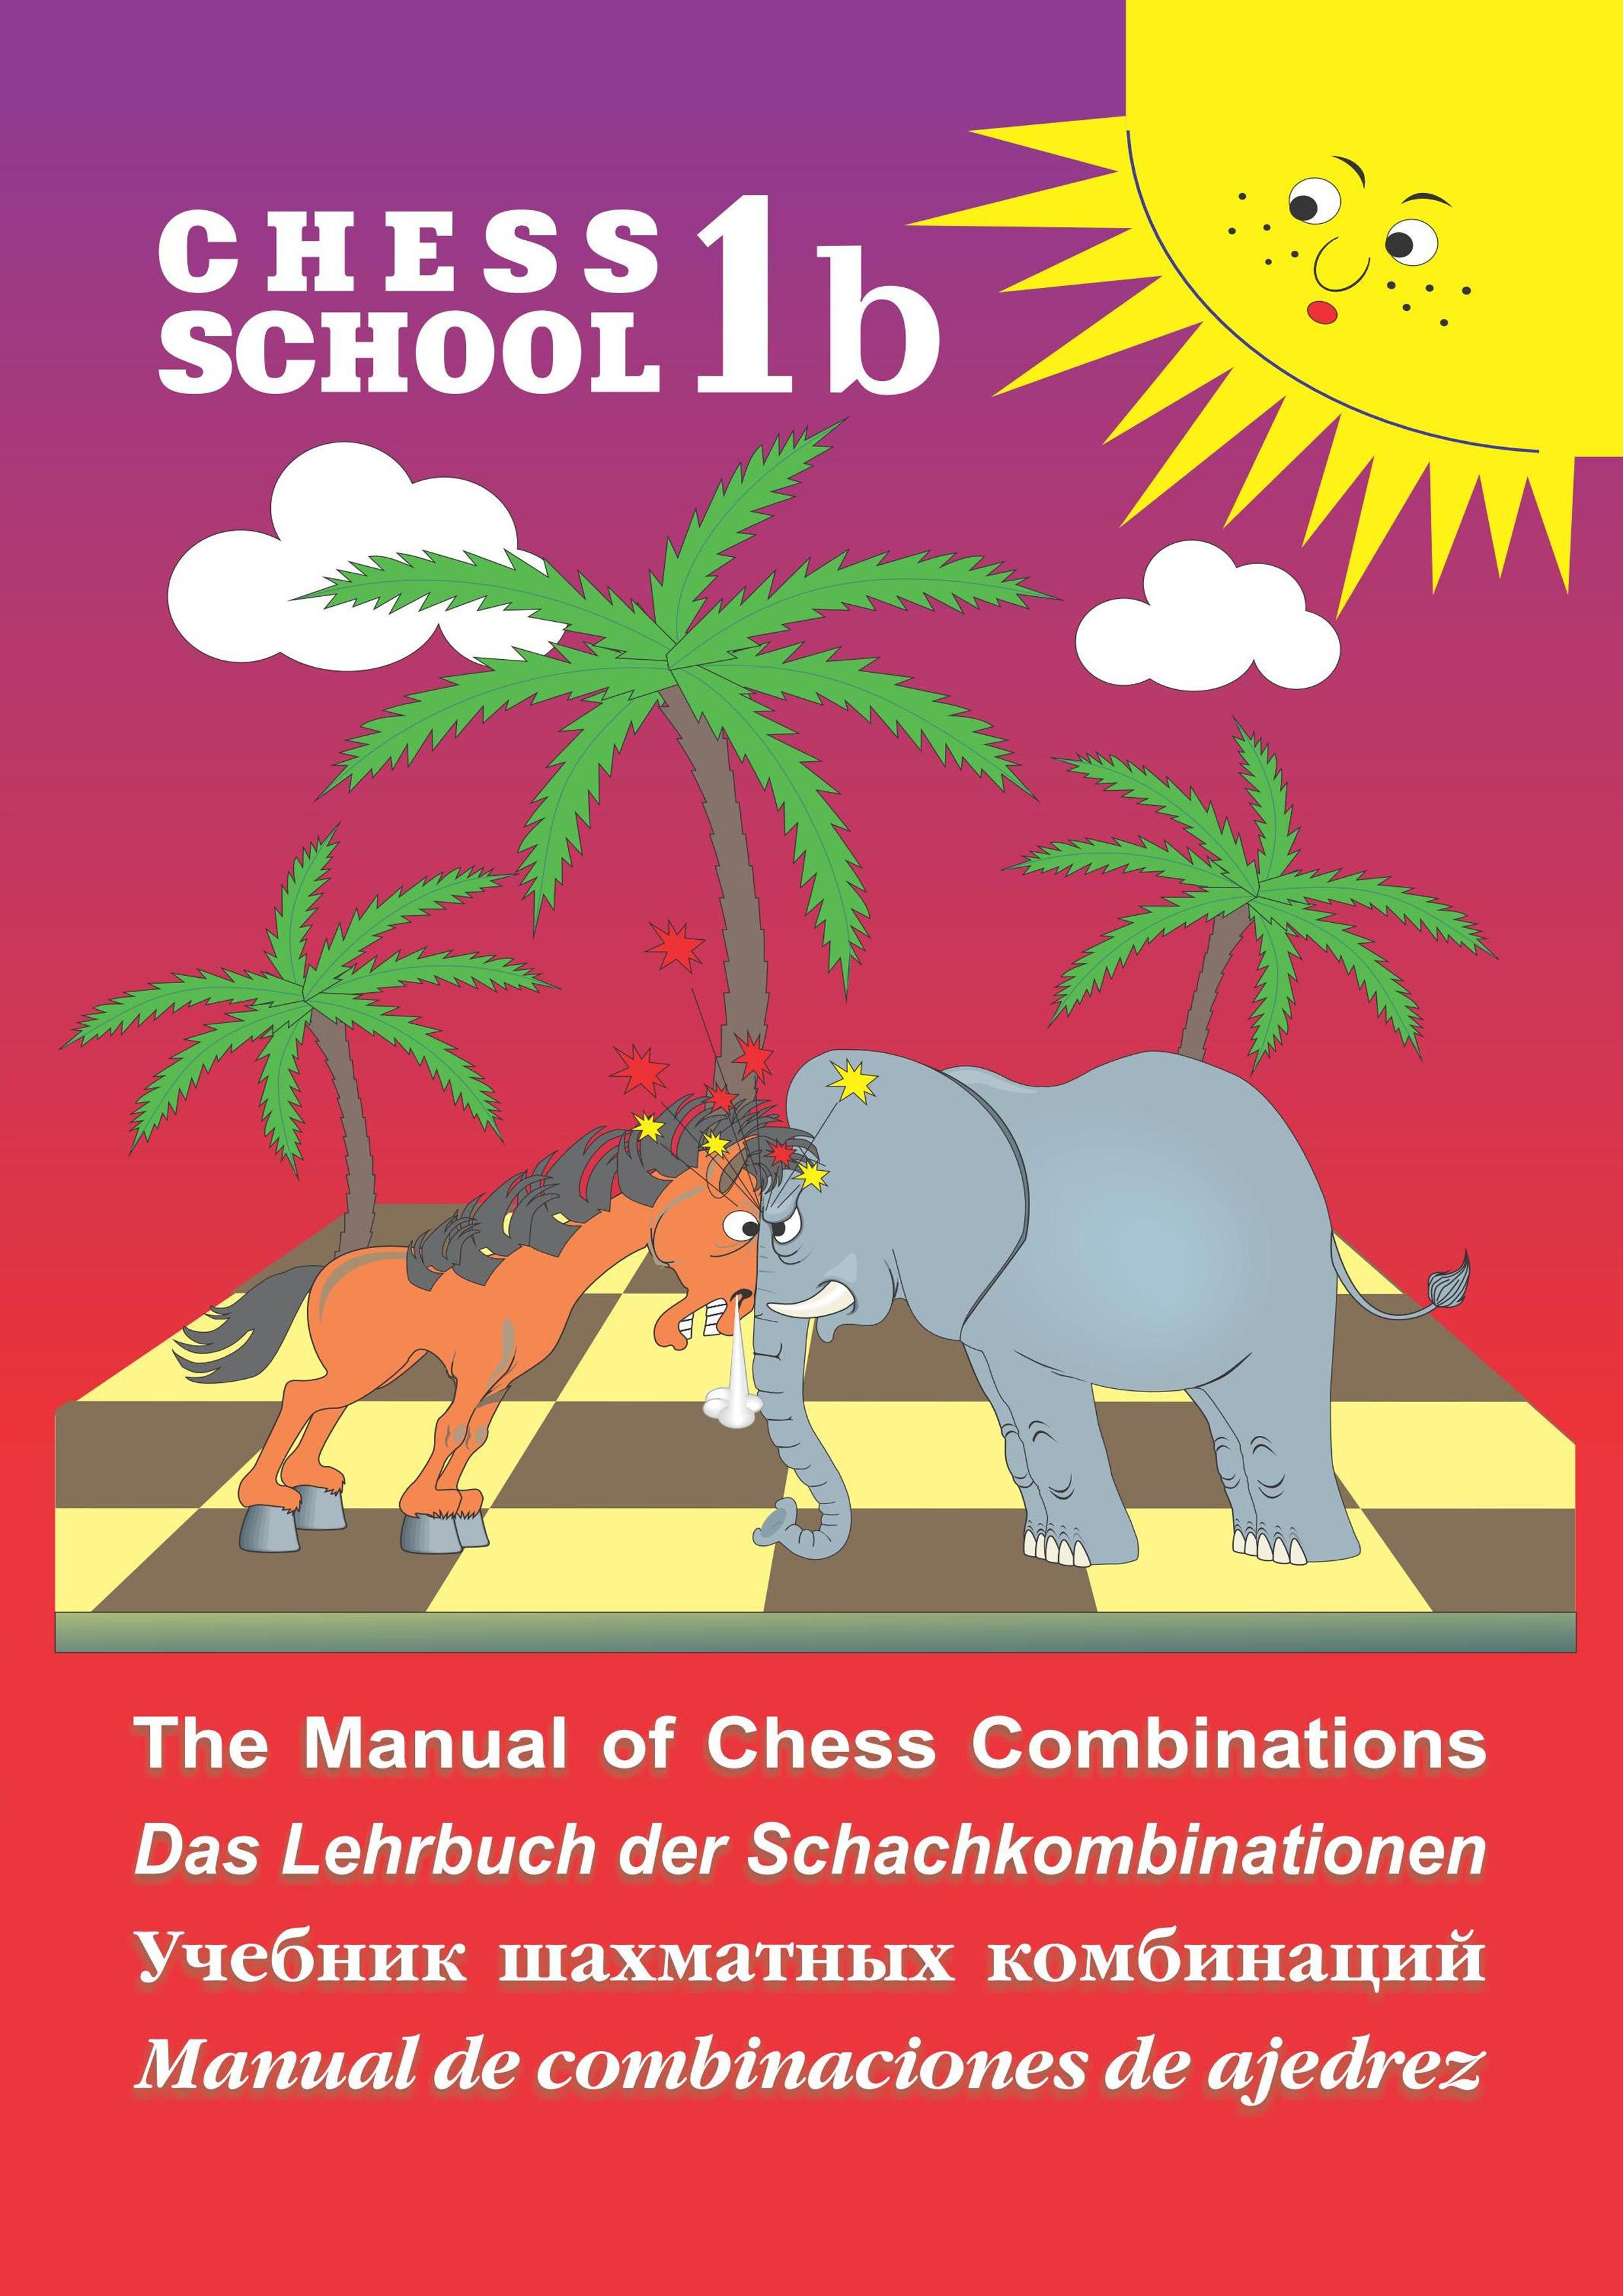 Сергей Иващенко The Manual of Chess Combination / Das Lehrbuch der Schachkombinationen / Manual de combinaciones de ajedrez / Учебник шахматных комбинаций. Том 1b иващенко с chess school 1b учебник шахматных комбинаций том 1b isbn 9785946935630